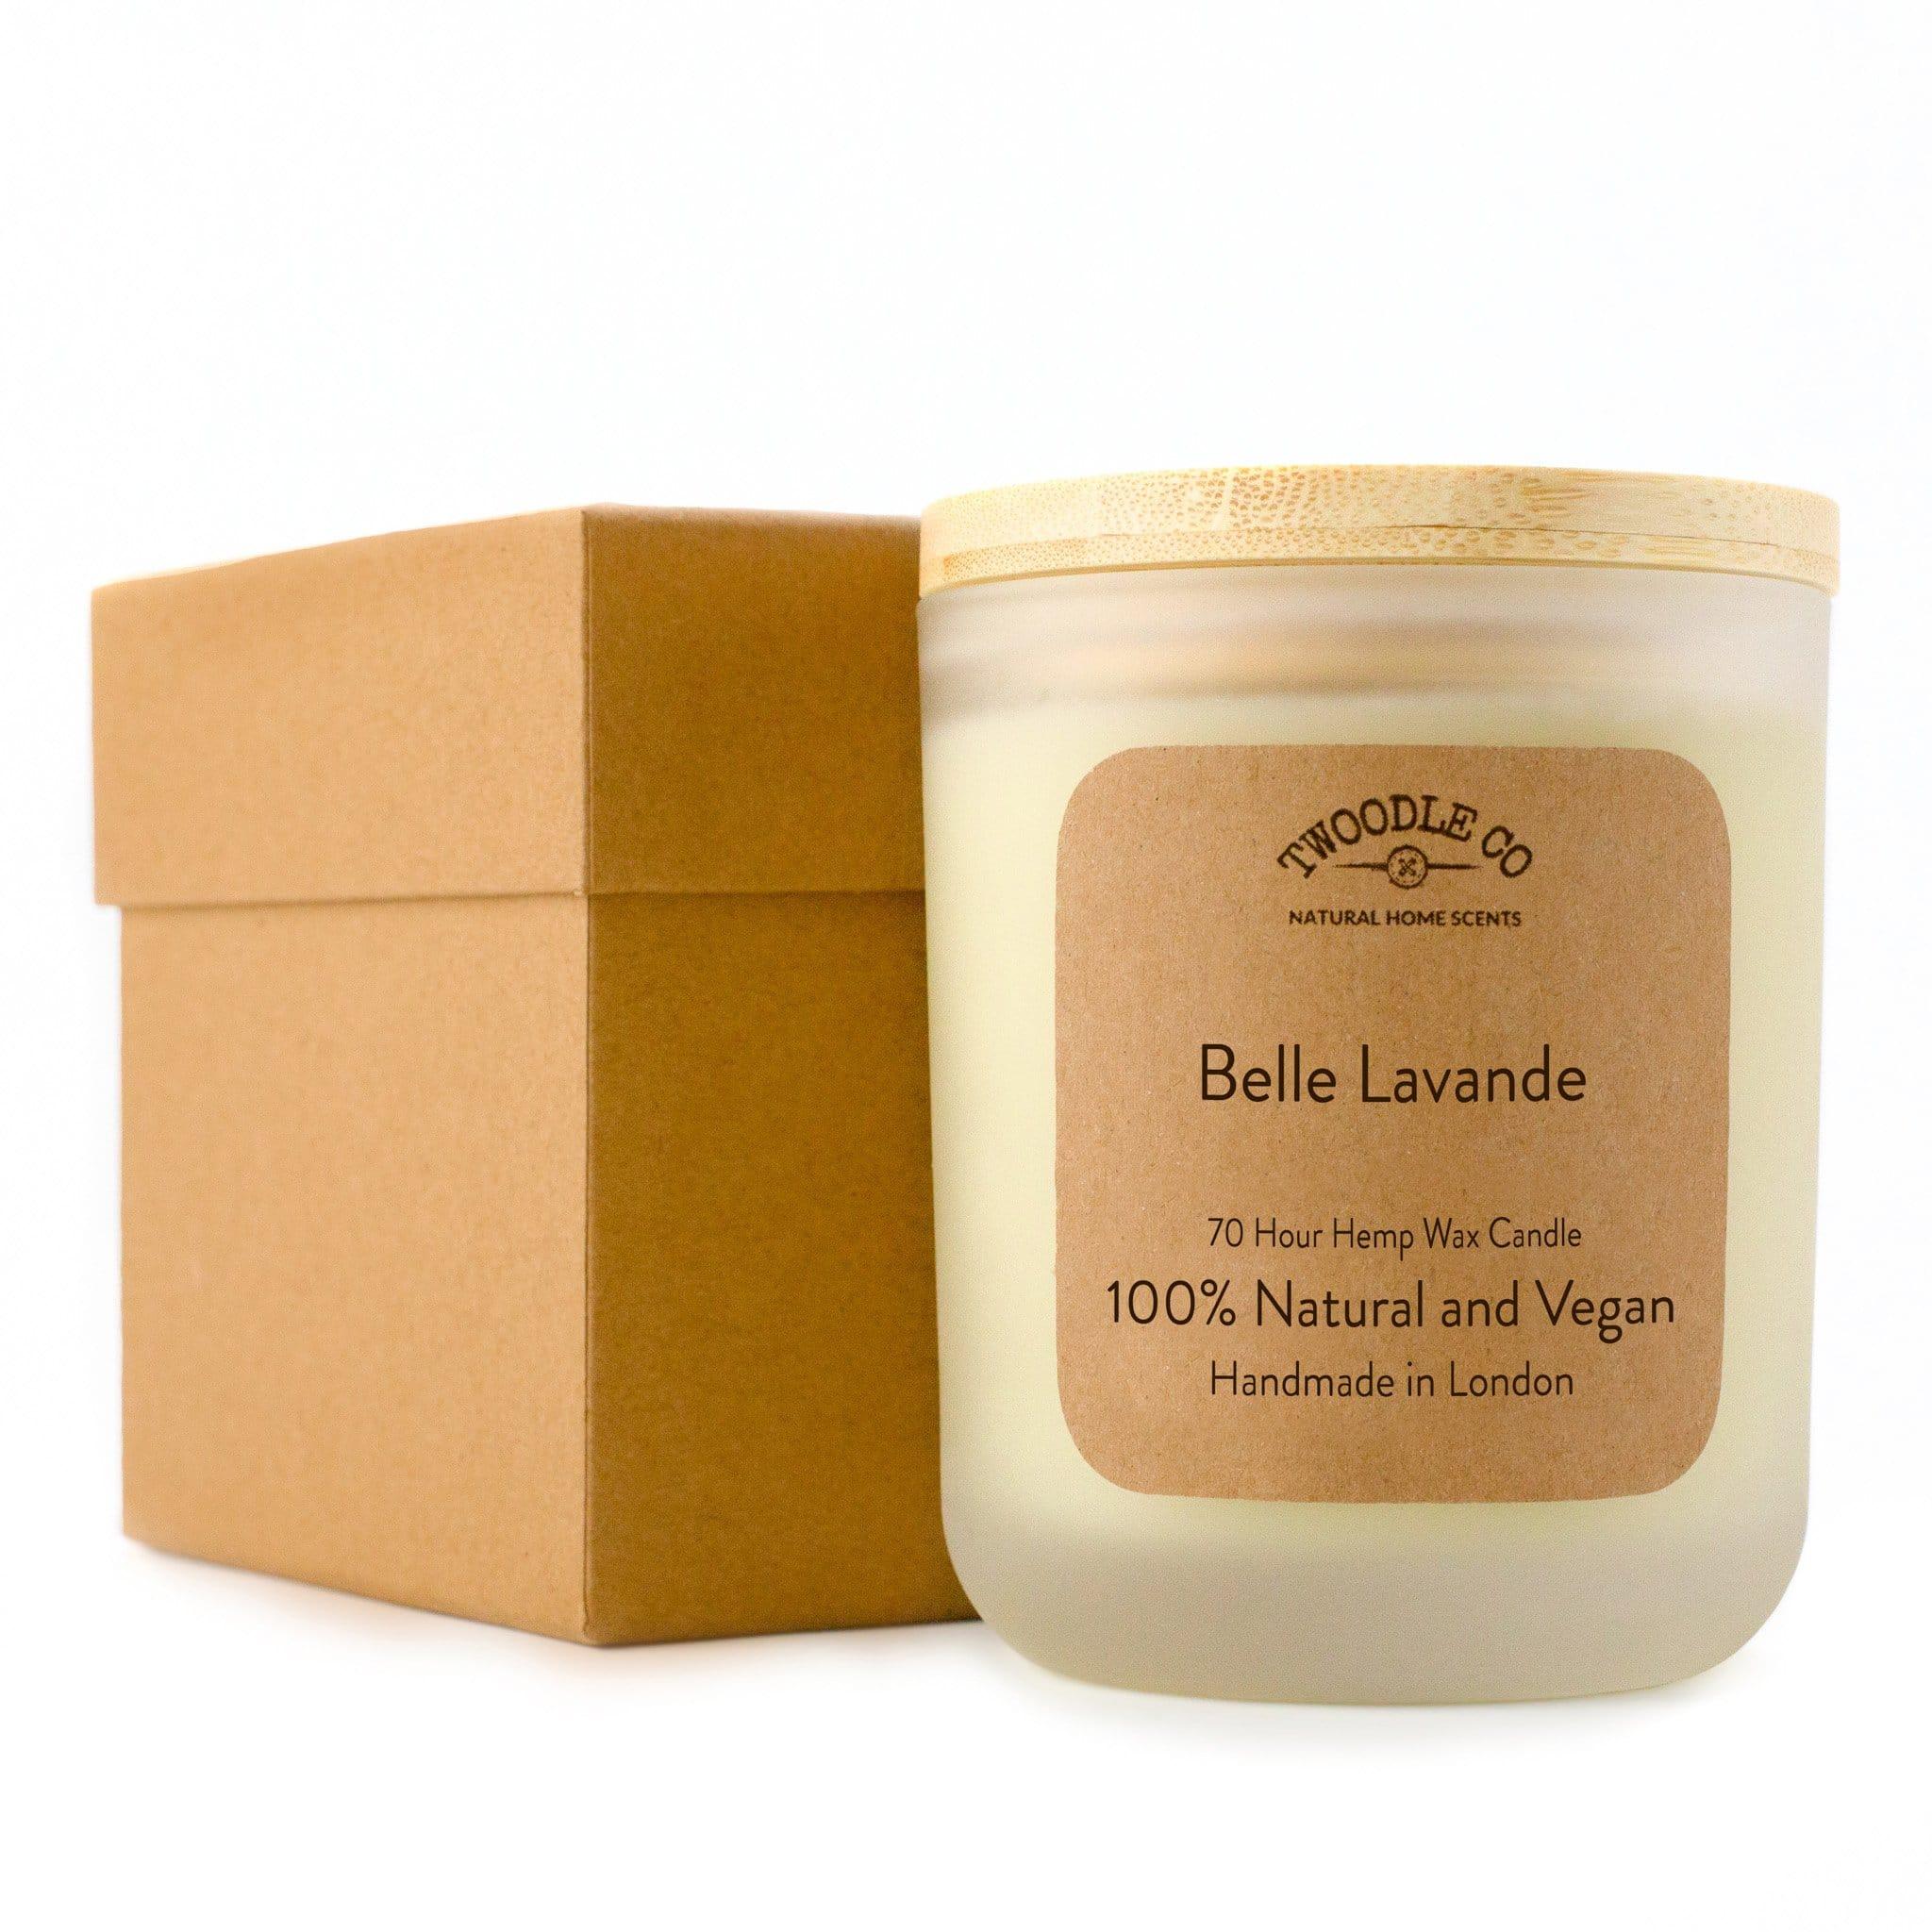 Twoodle Co Large Scented Candle Belle Lavande